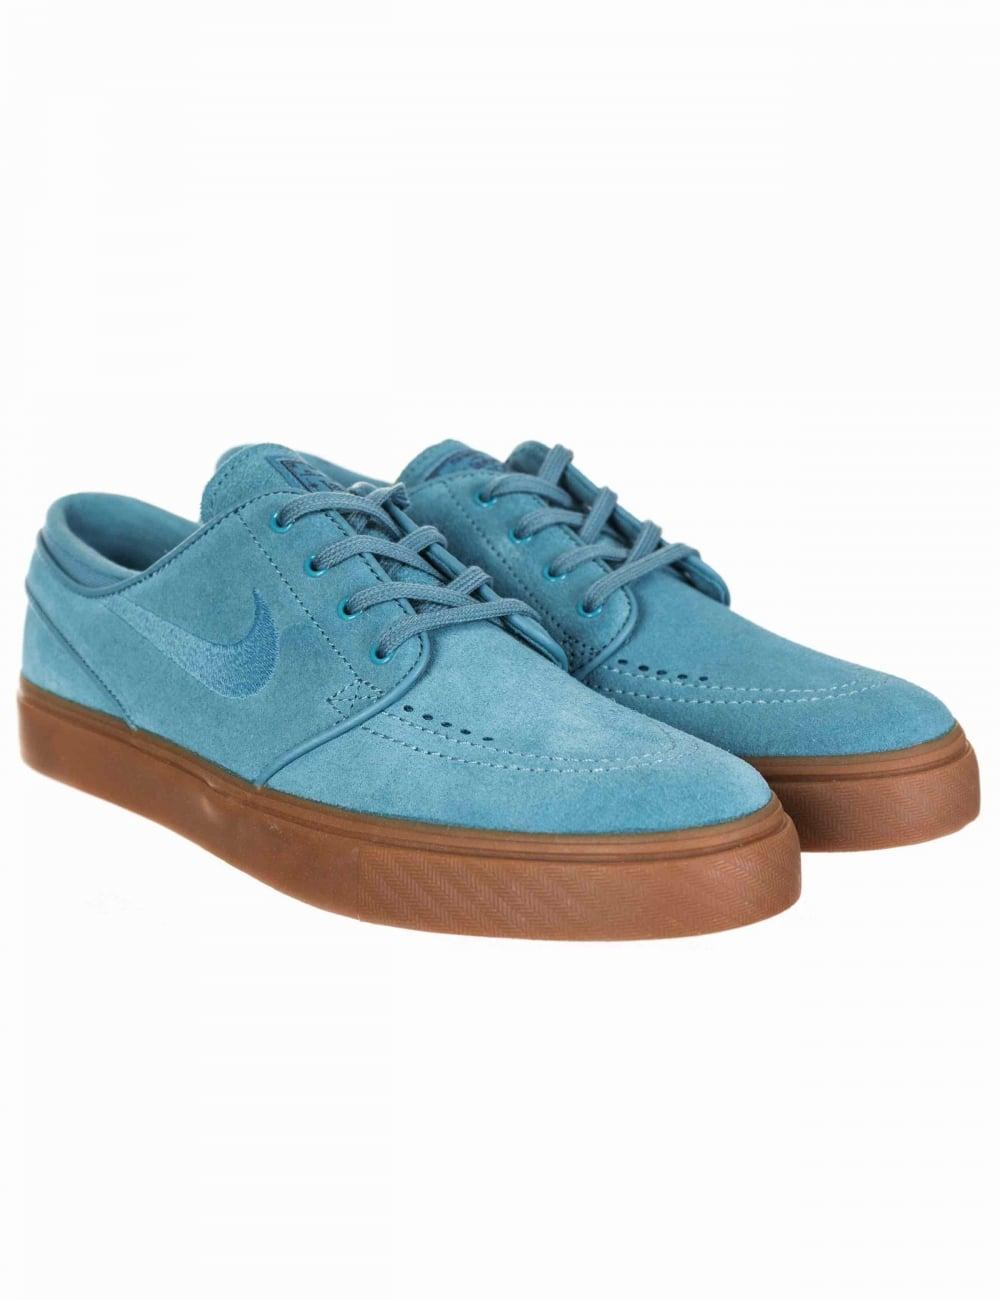 300cb135523a Nike SB Stefan Janoski Trainers - Noise Aqua Noise Aqua - Footwear ...